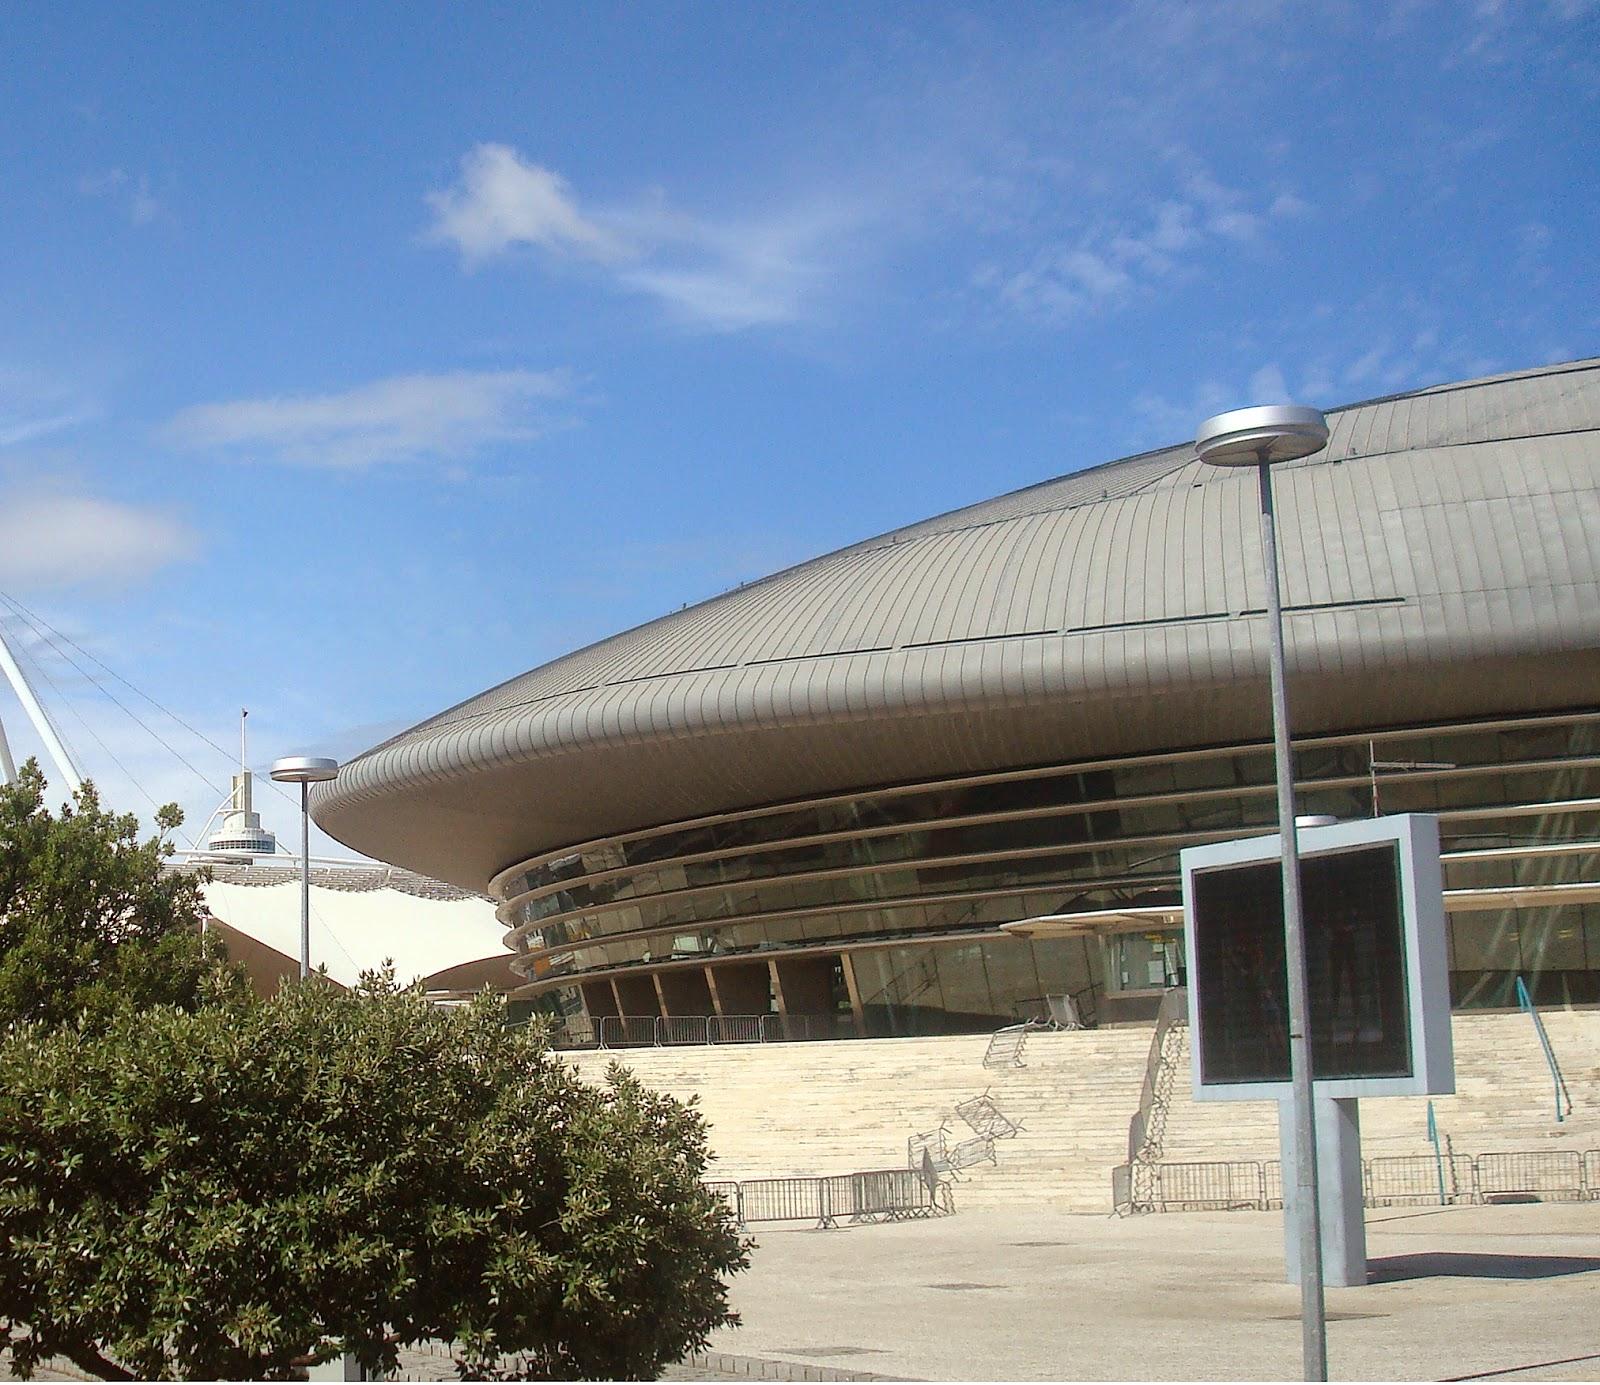 Atlantic Pavilion, Lisbon, Portugal